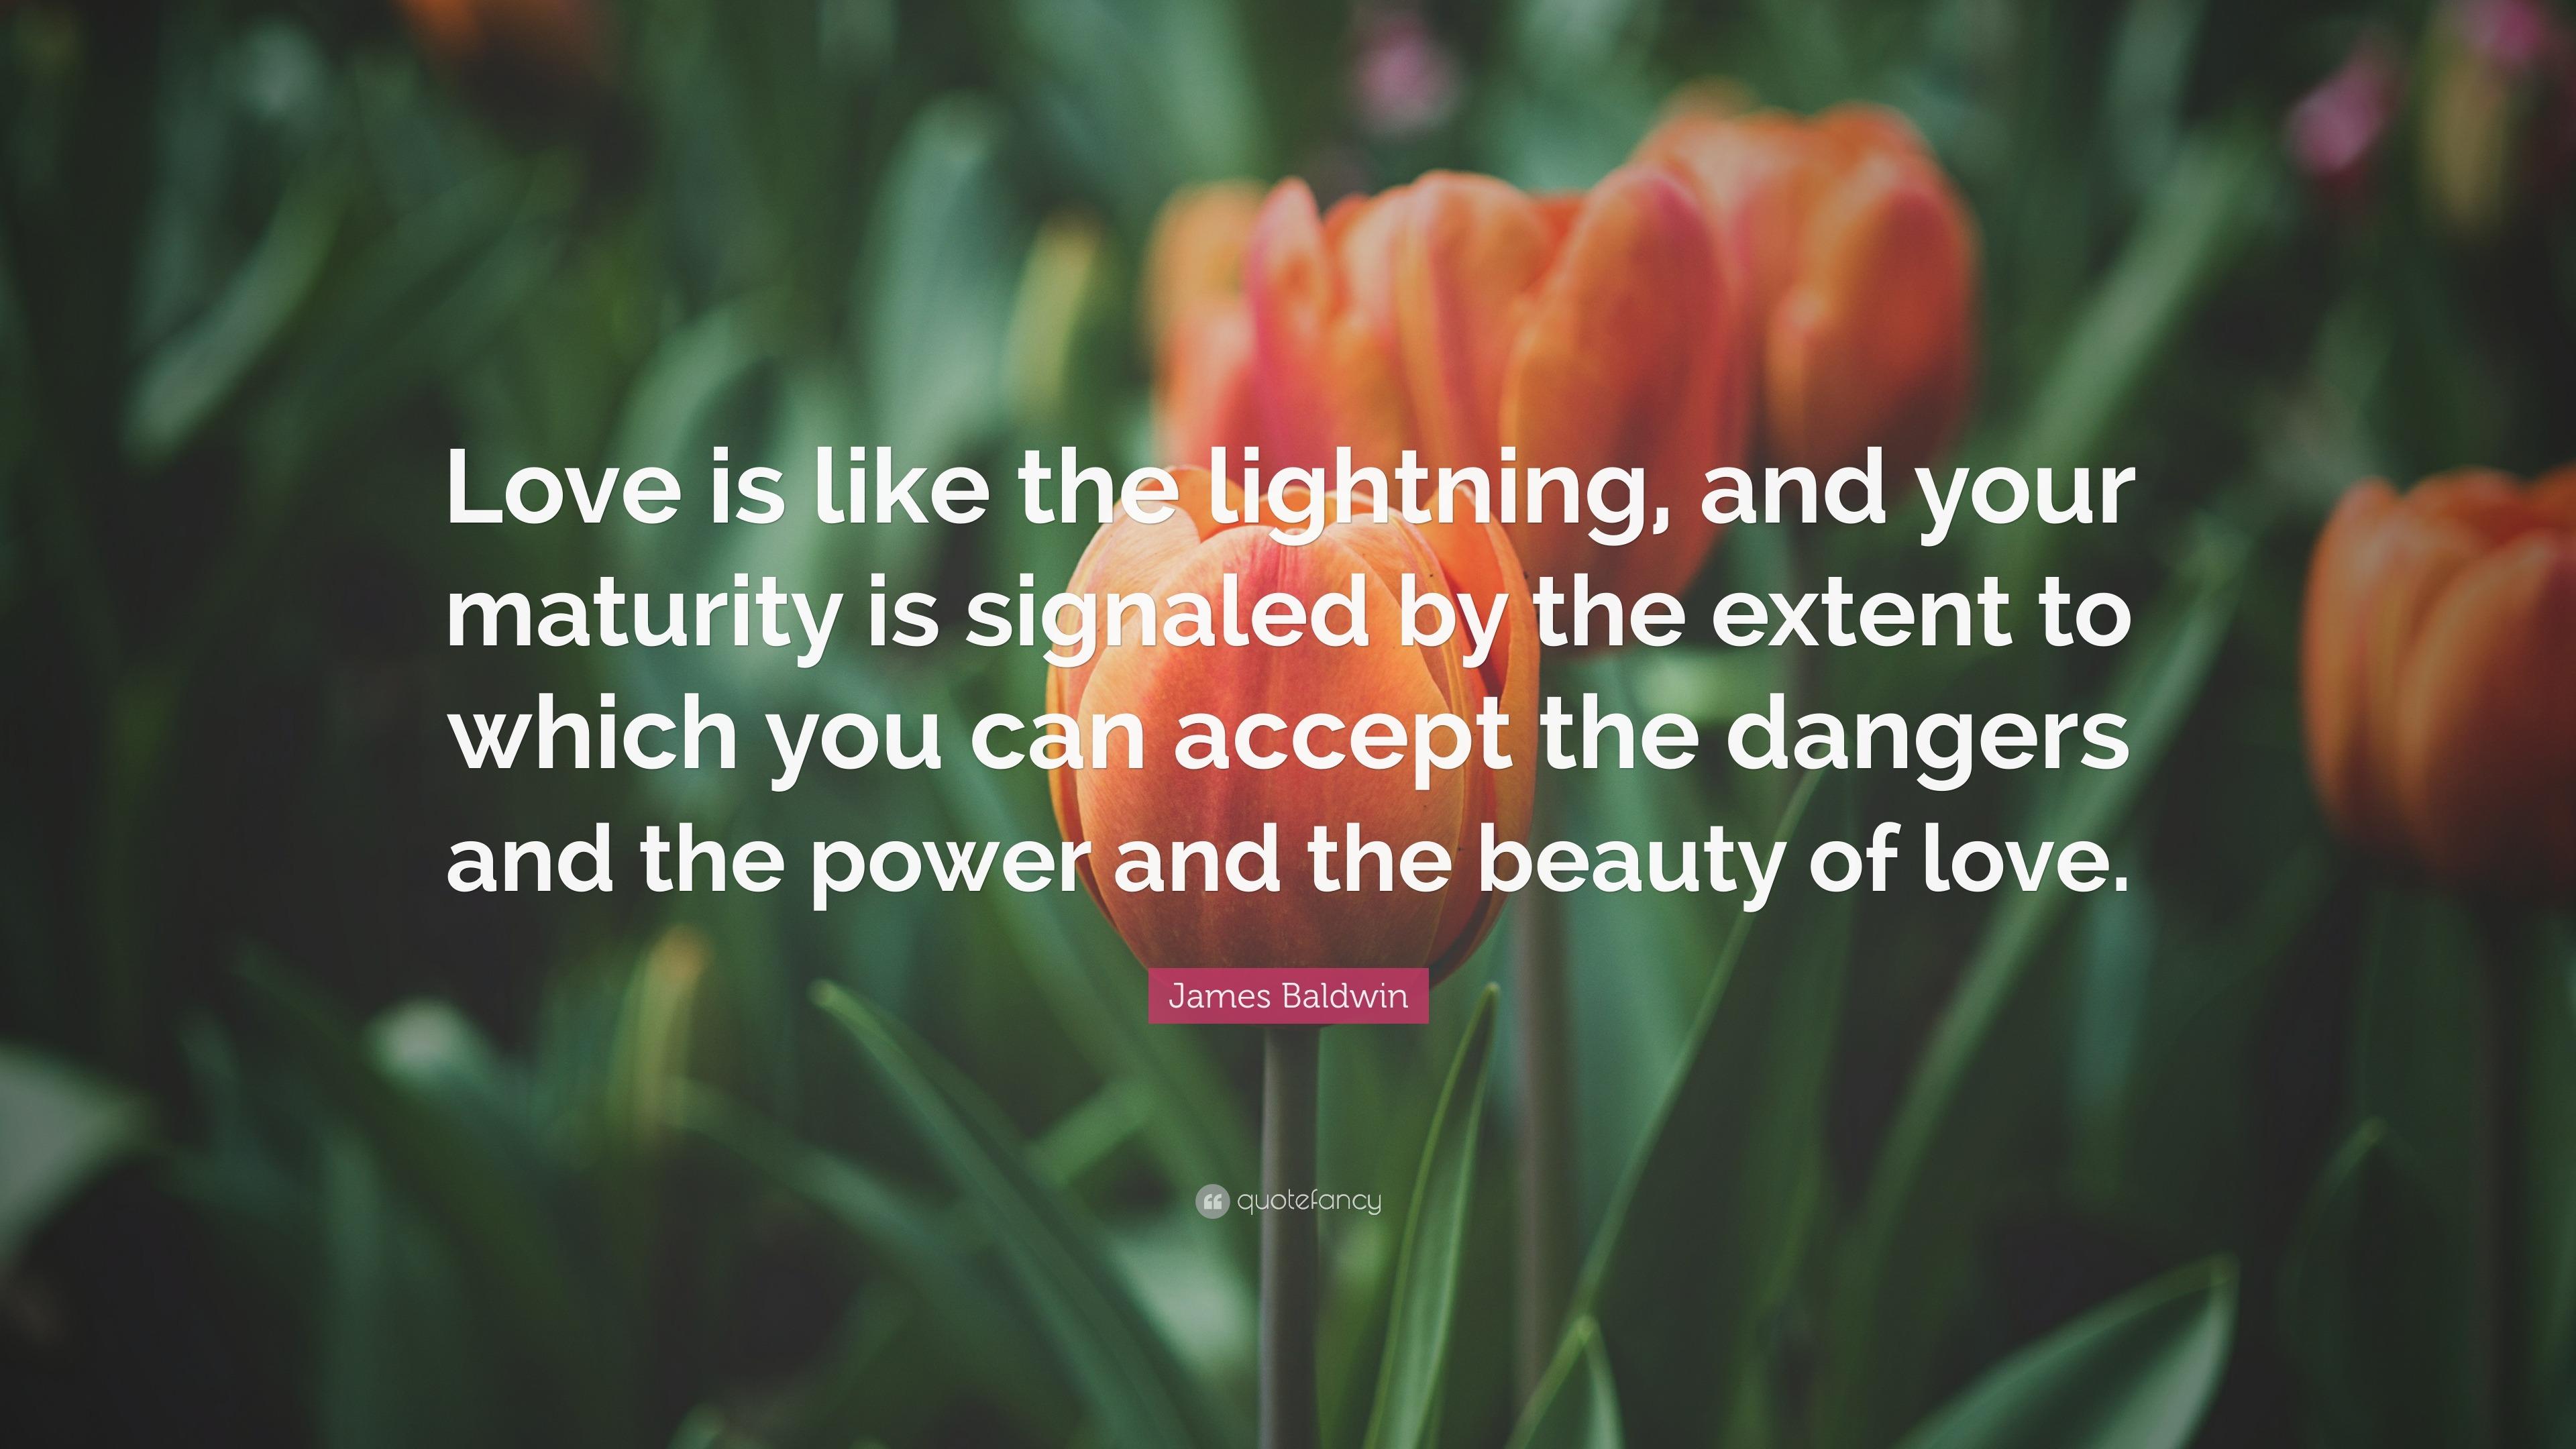 James baldwin quote love is like the lightning and your maturity james baldwin quote love is like the lightning and your maturity is signaled izmirmasajfo